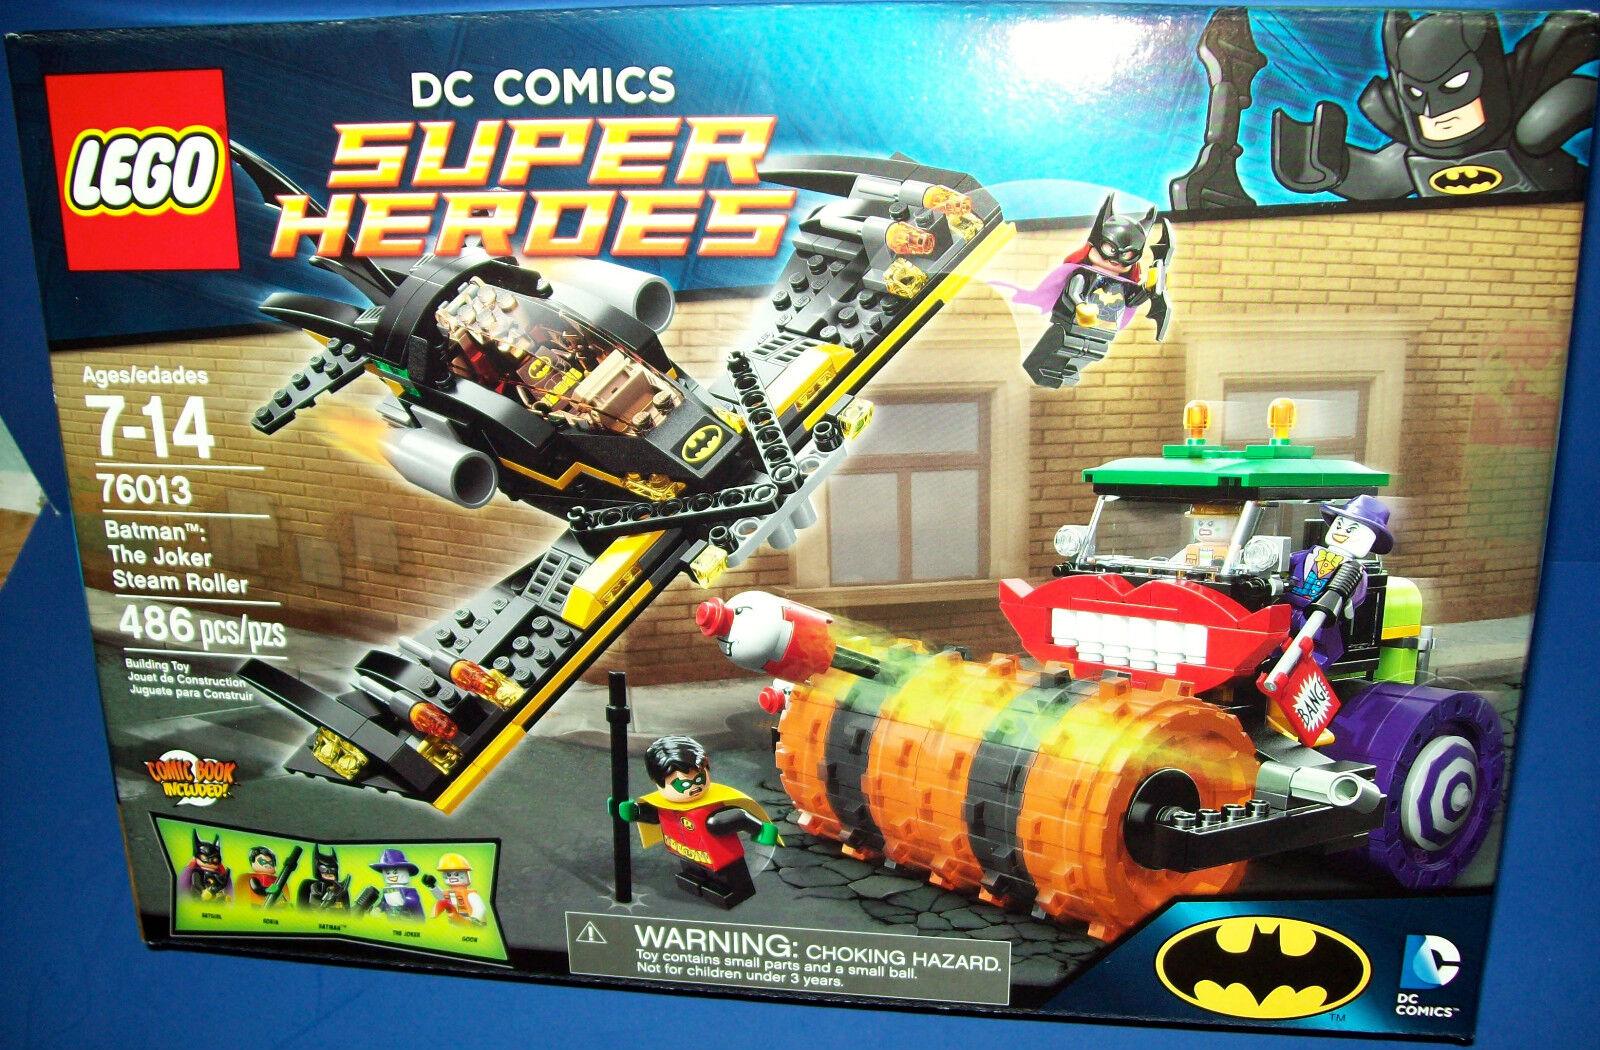 Lego 76013 Supereroi Dc Comics Batman The Joker Steam Roller Nisb 5-figures